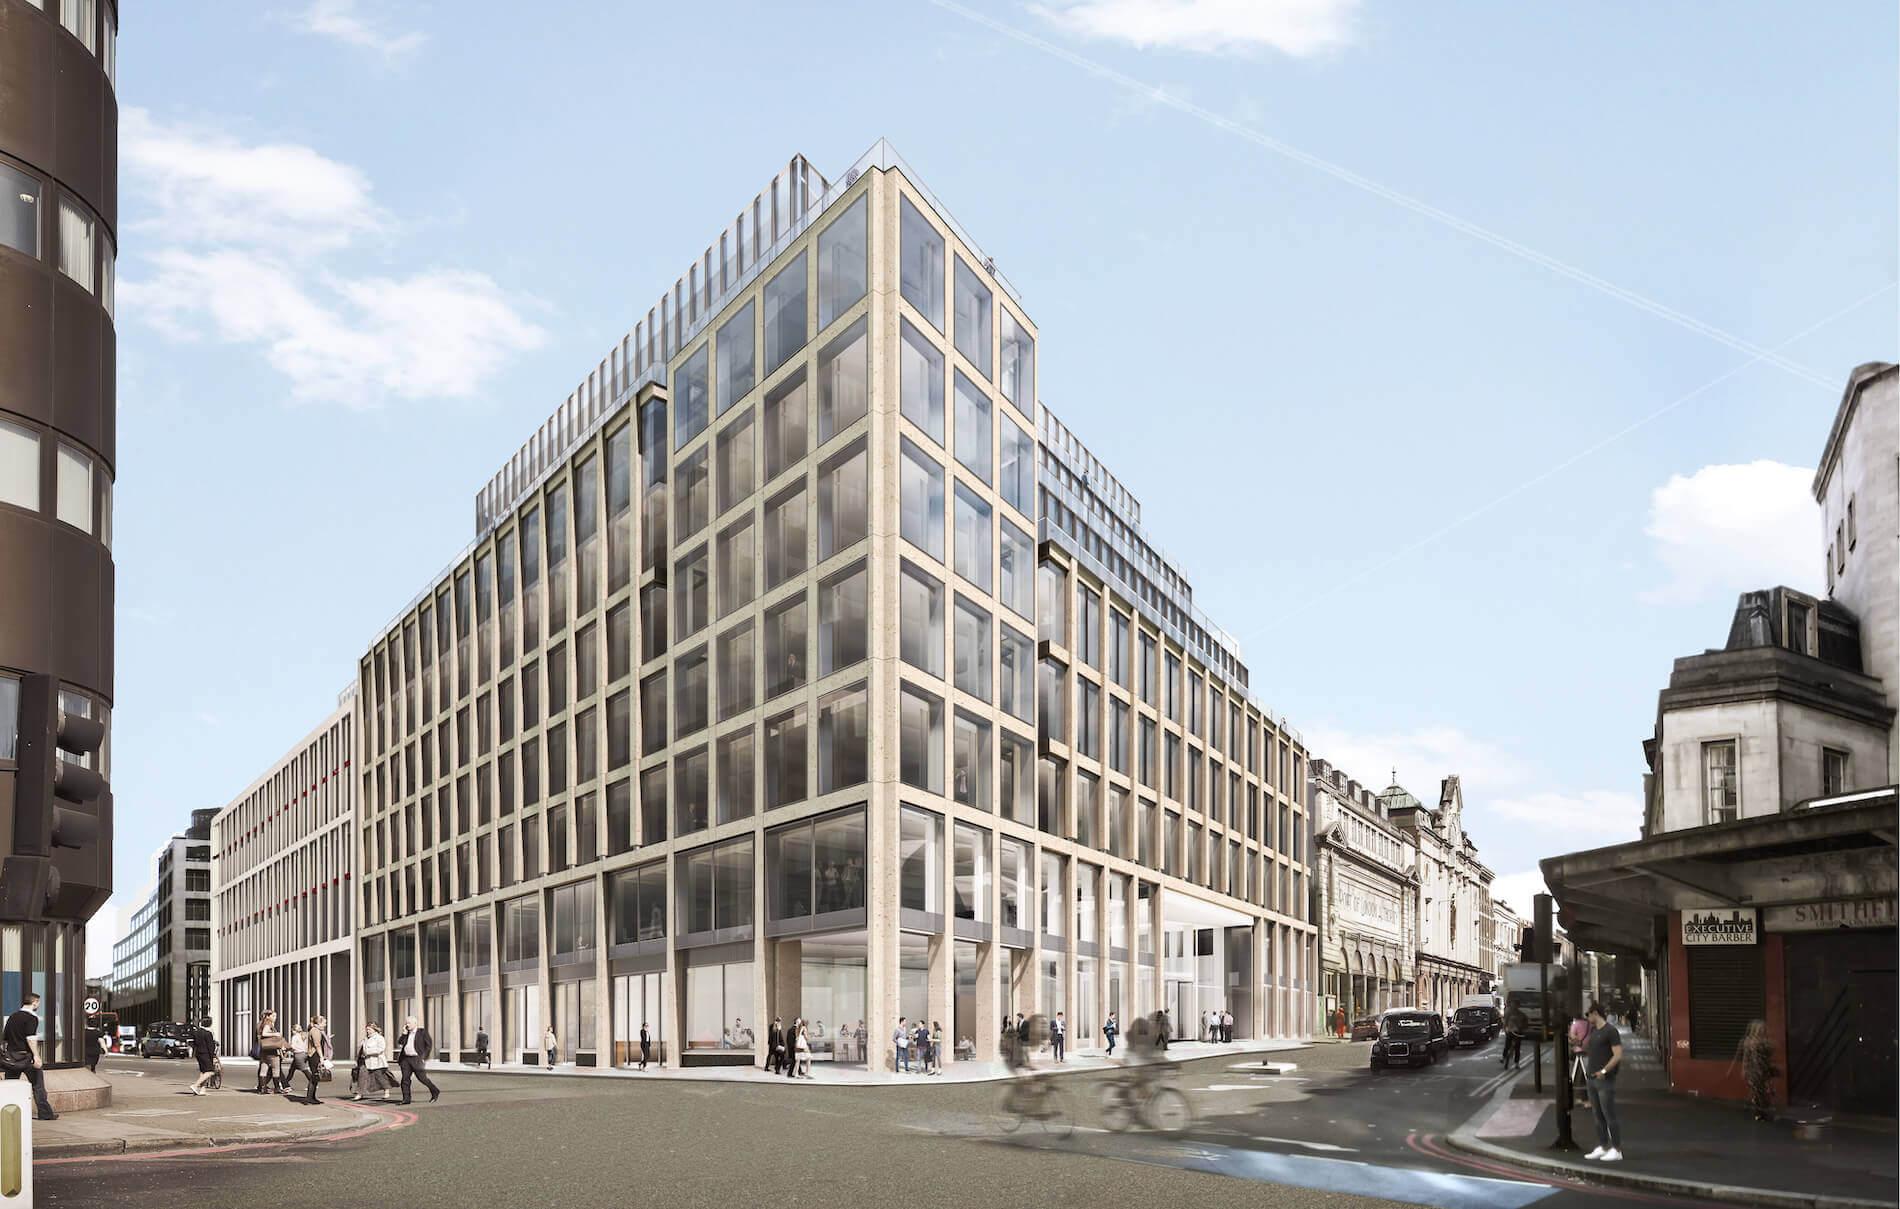 SES lands £25m MEP contract on London smart building